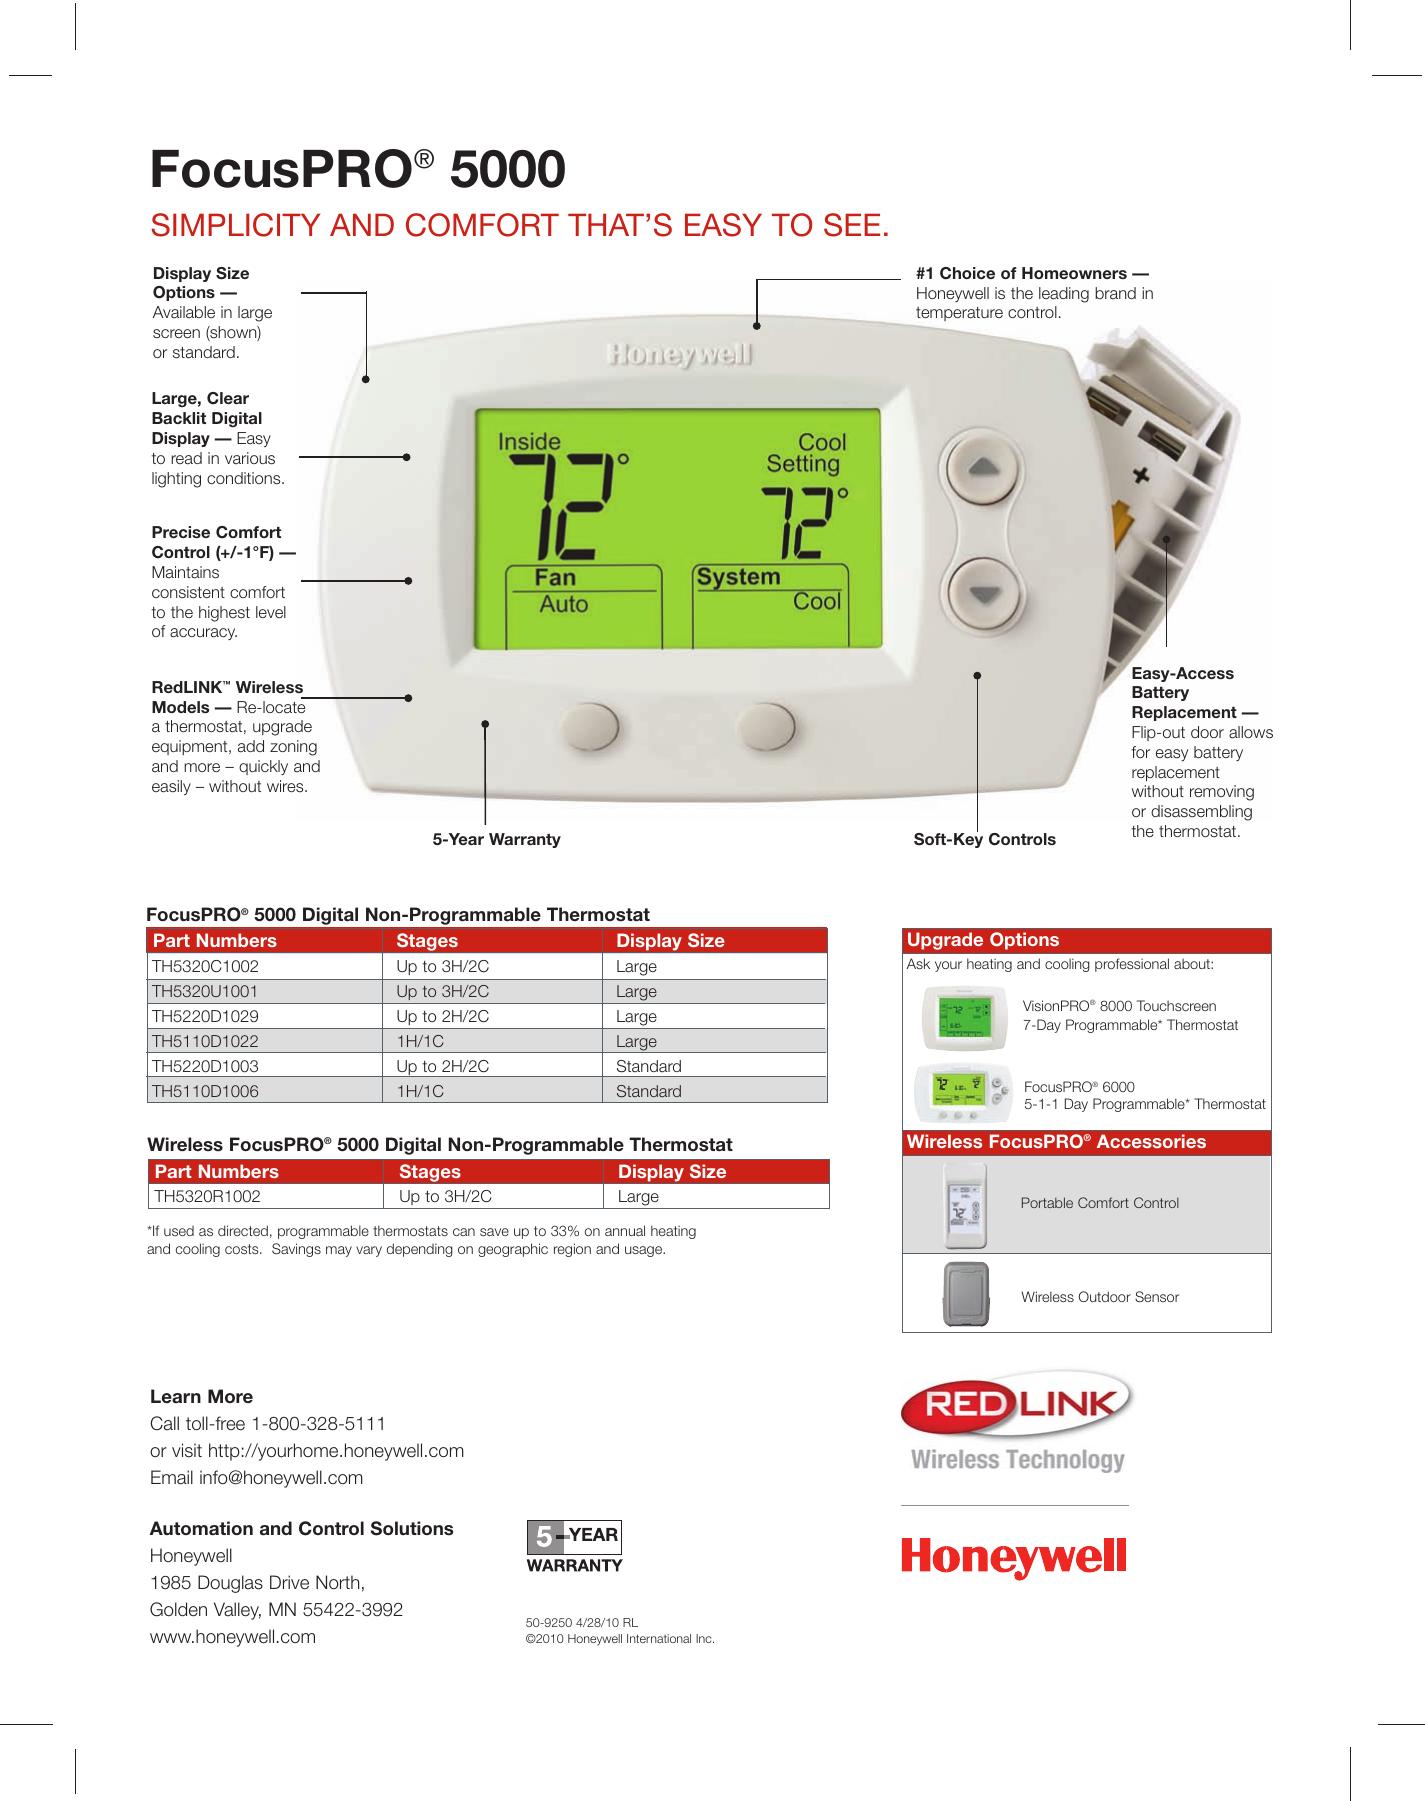 Honeywell Focuspro 5000 Wiring Diagram on goodman heat pump wiring diagram, honeywell thermostat wiring diagram, honeywell thermostat wiring problems,